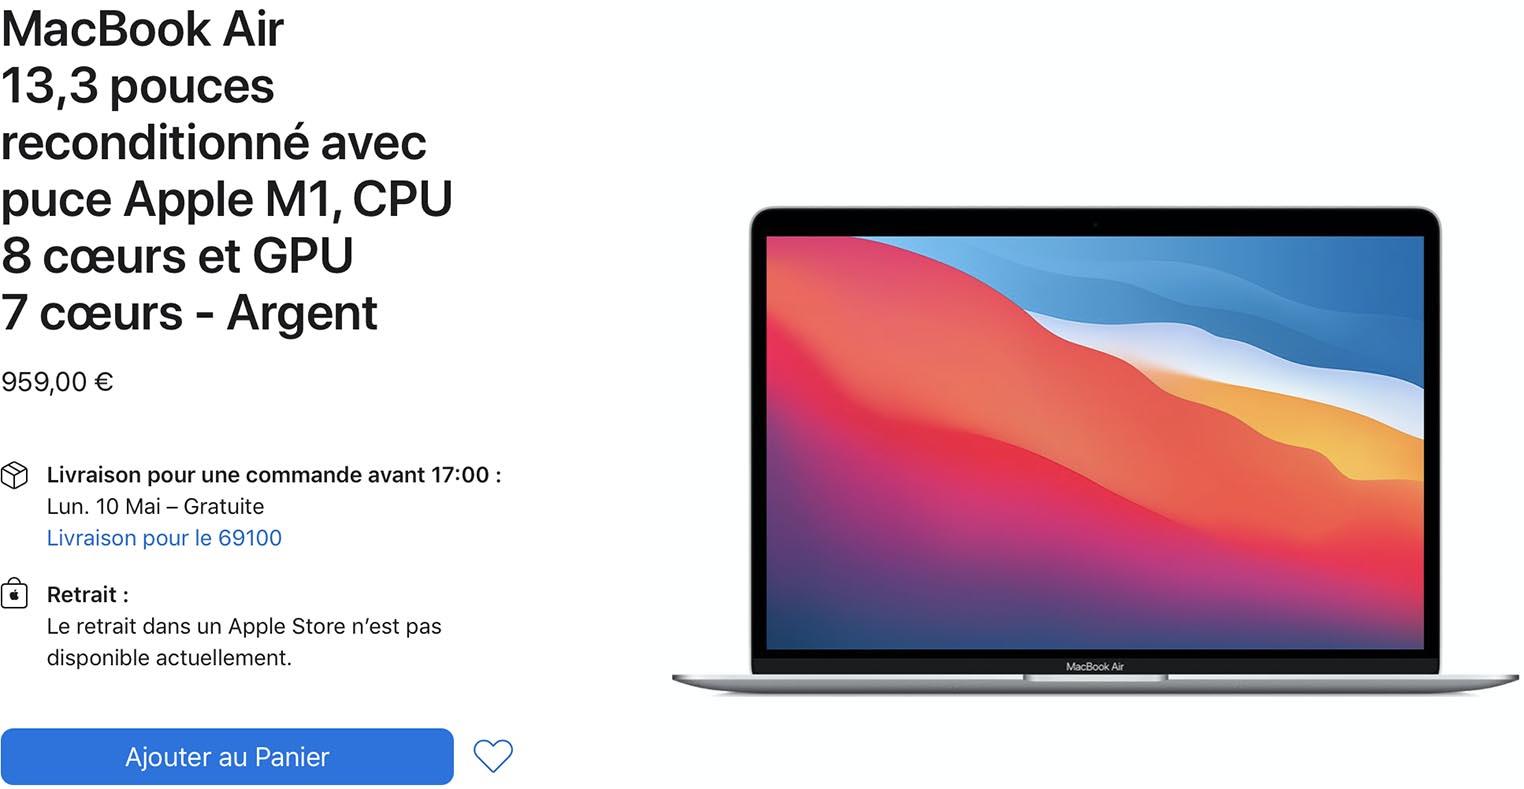 MacBook Air M1 Refurb Store